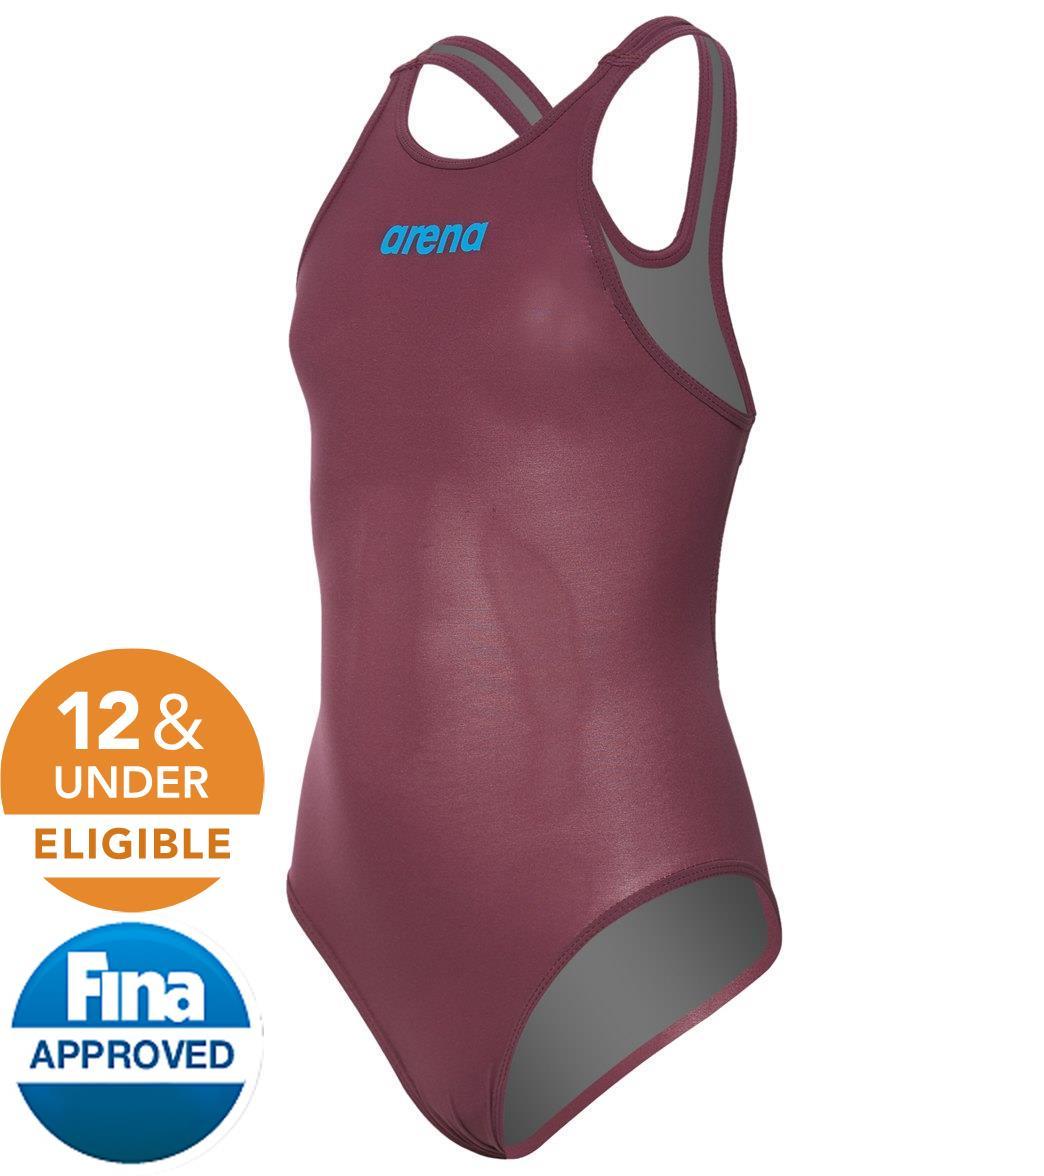 Open Back Swimsuit Arena Girls Powerskin R-evo One